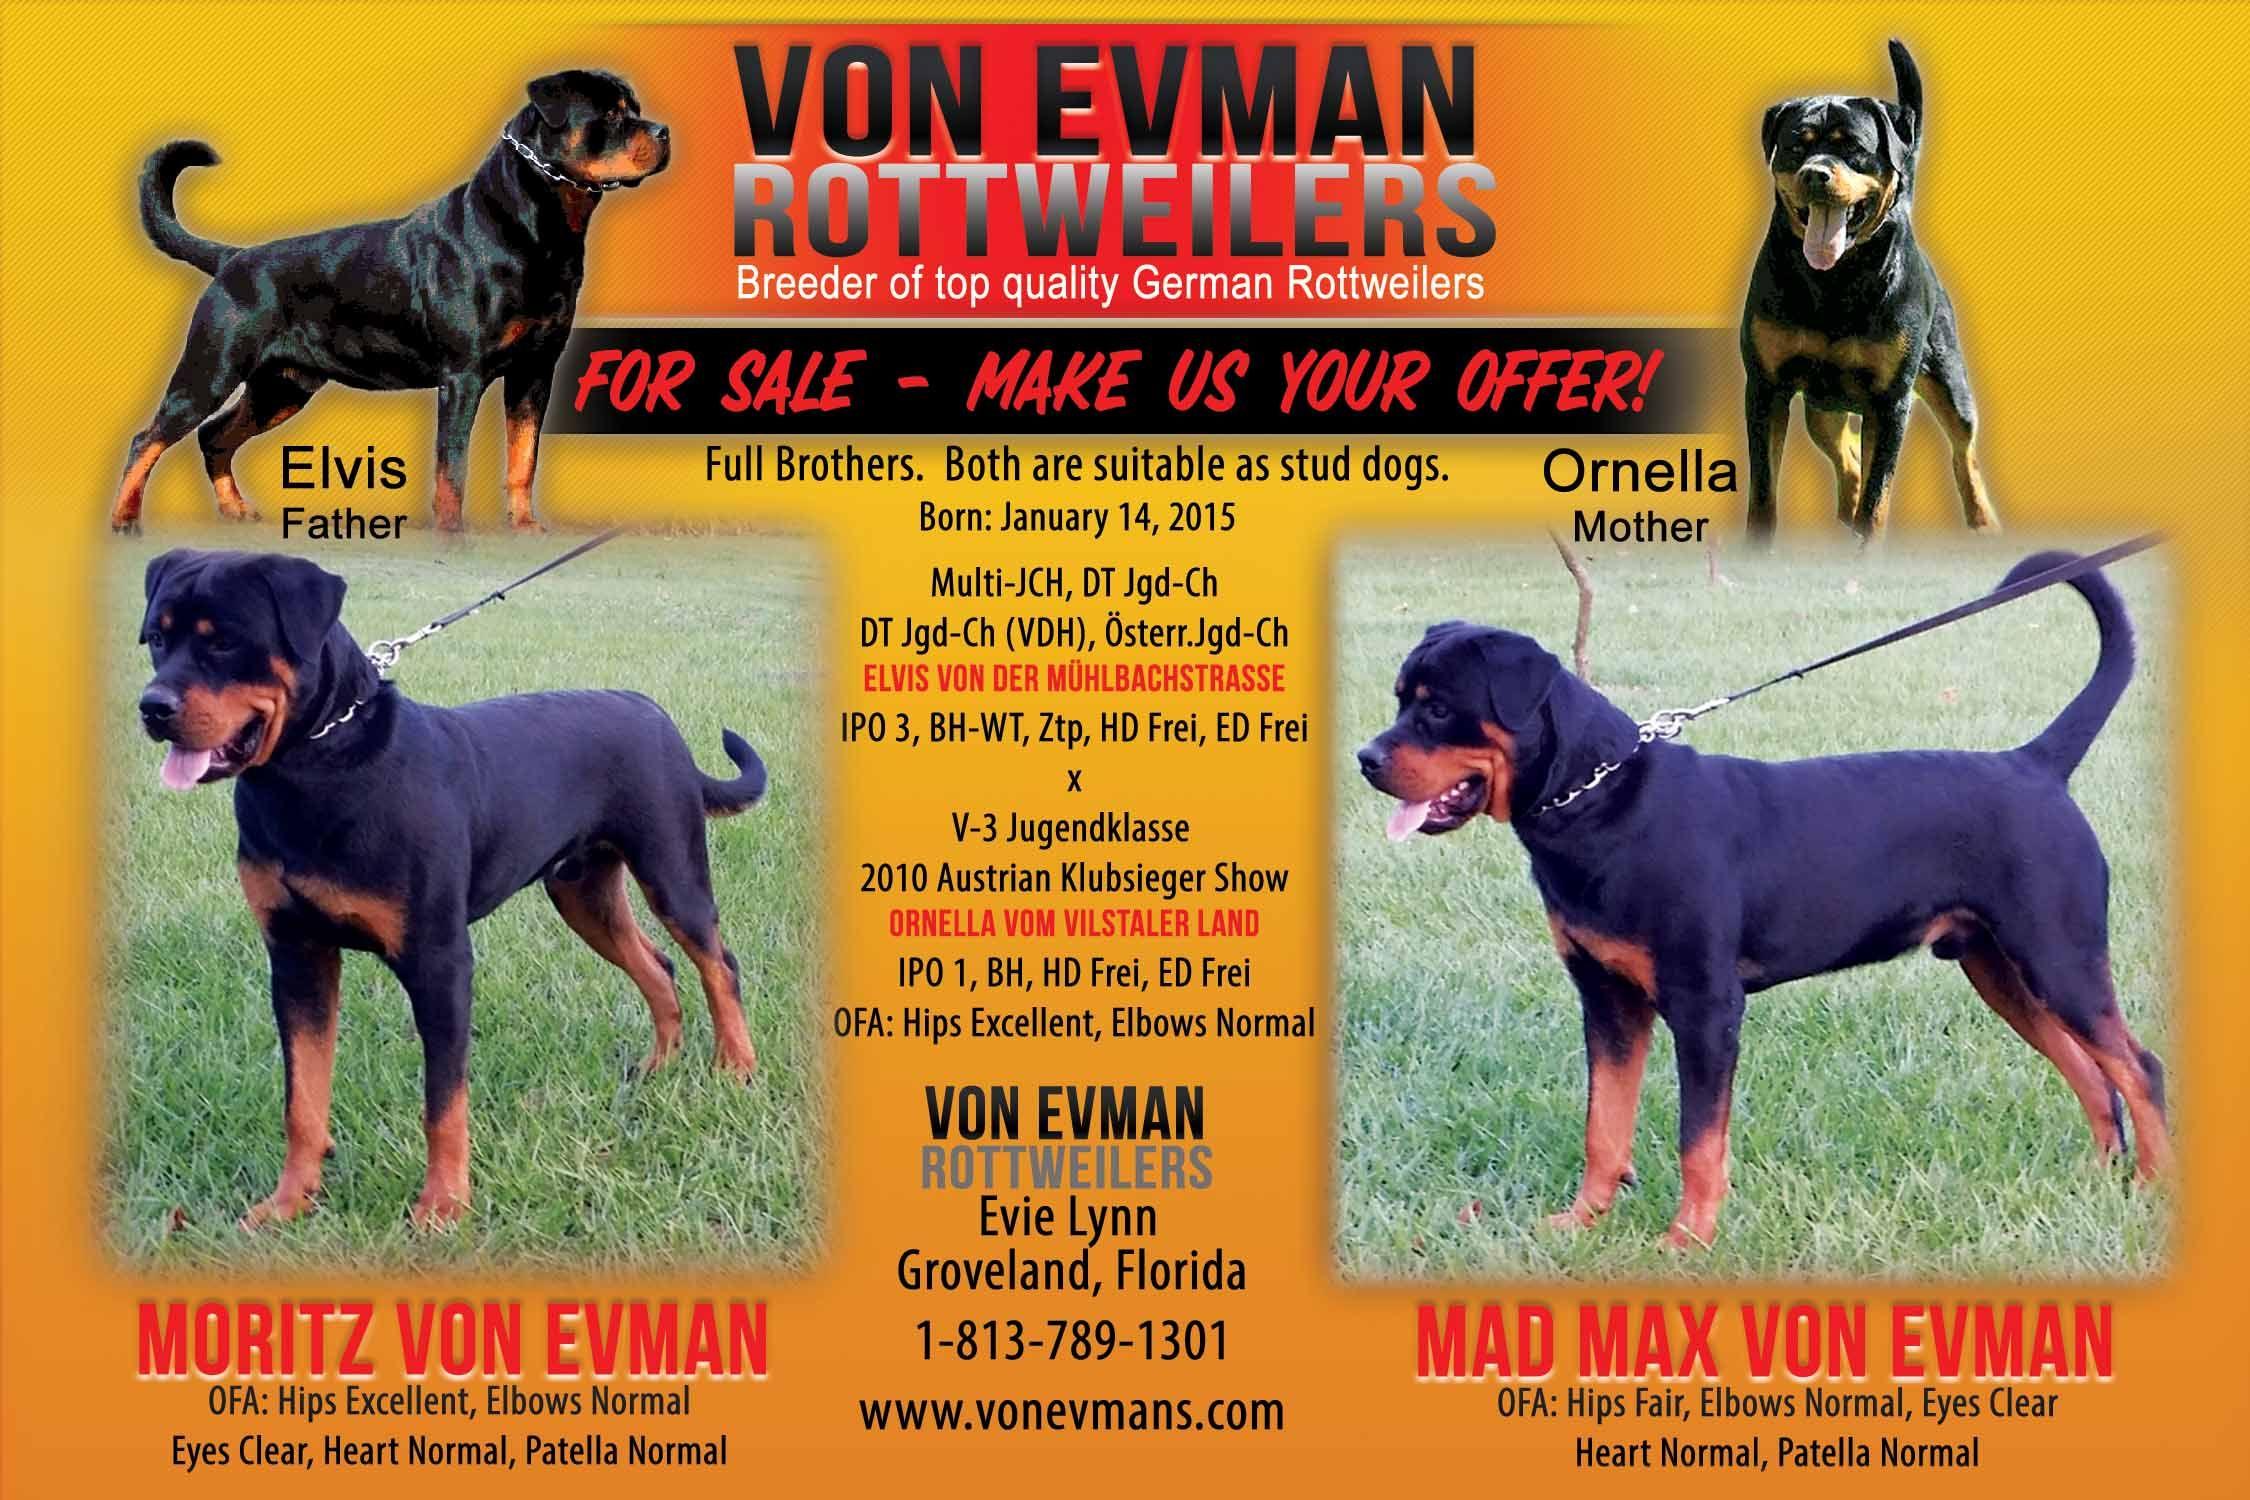 Evie Lynn Groveland Florida 1 813 789 1301 Www Vonevmans Com